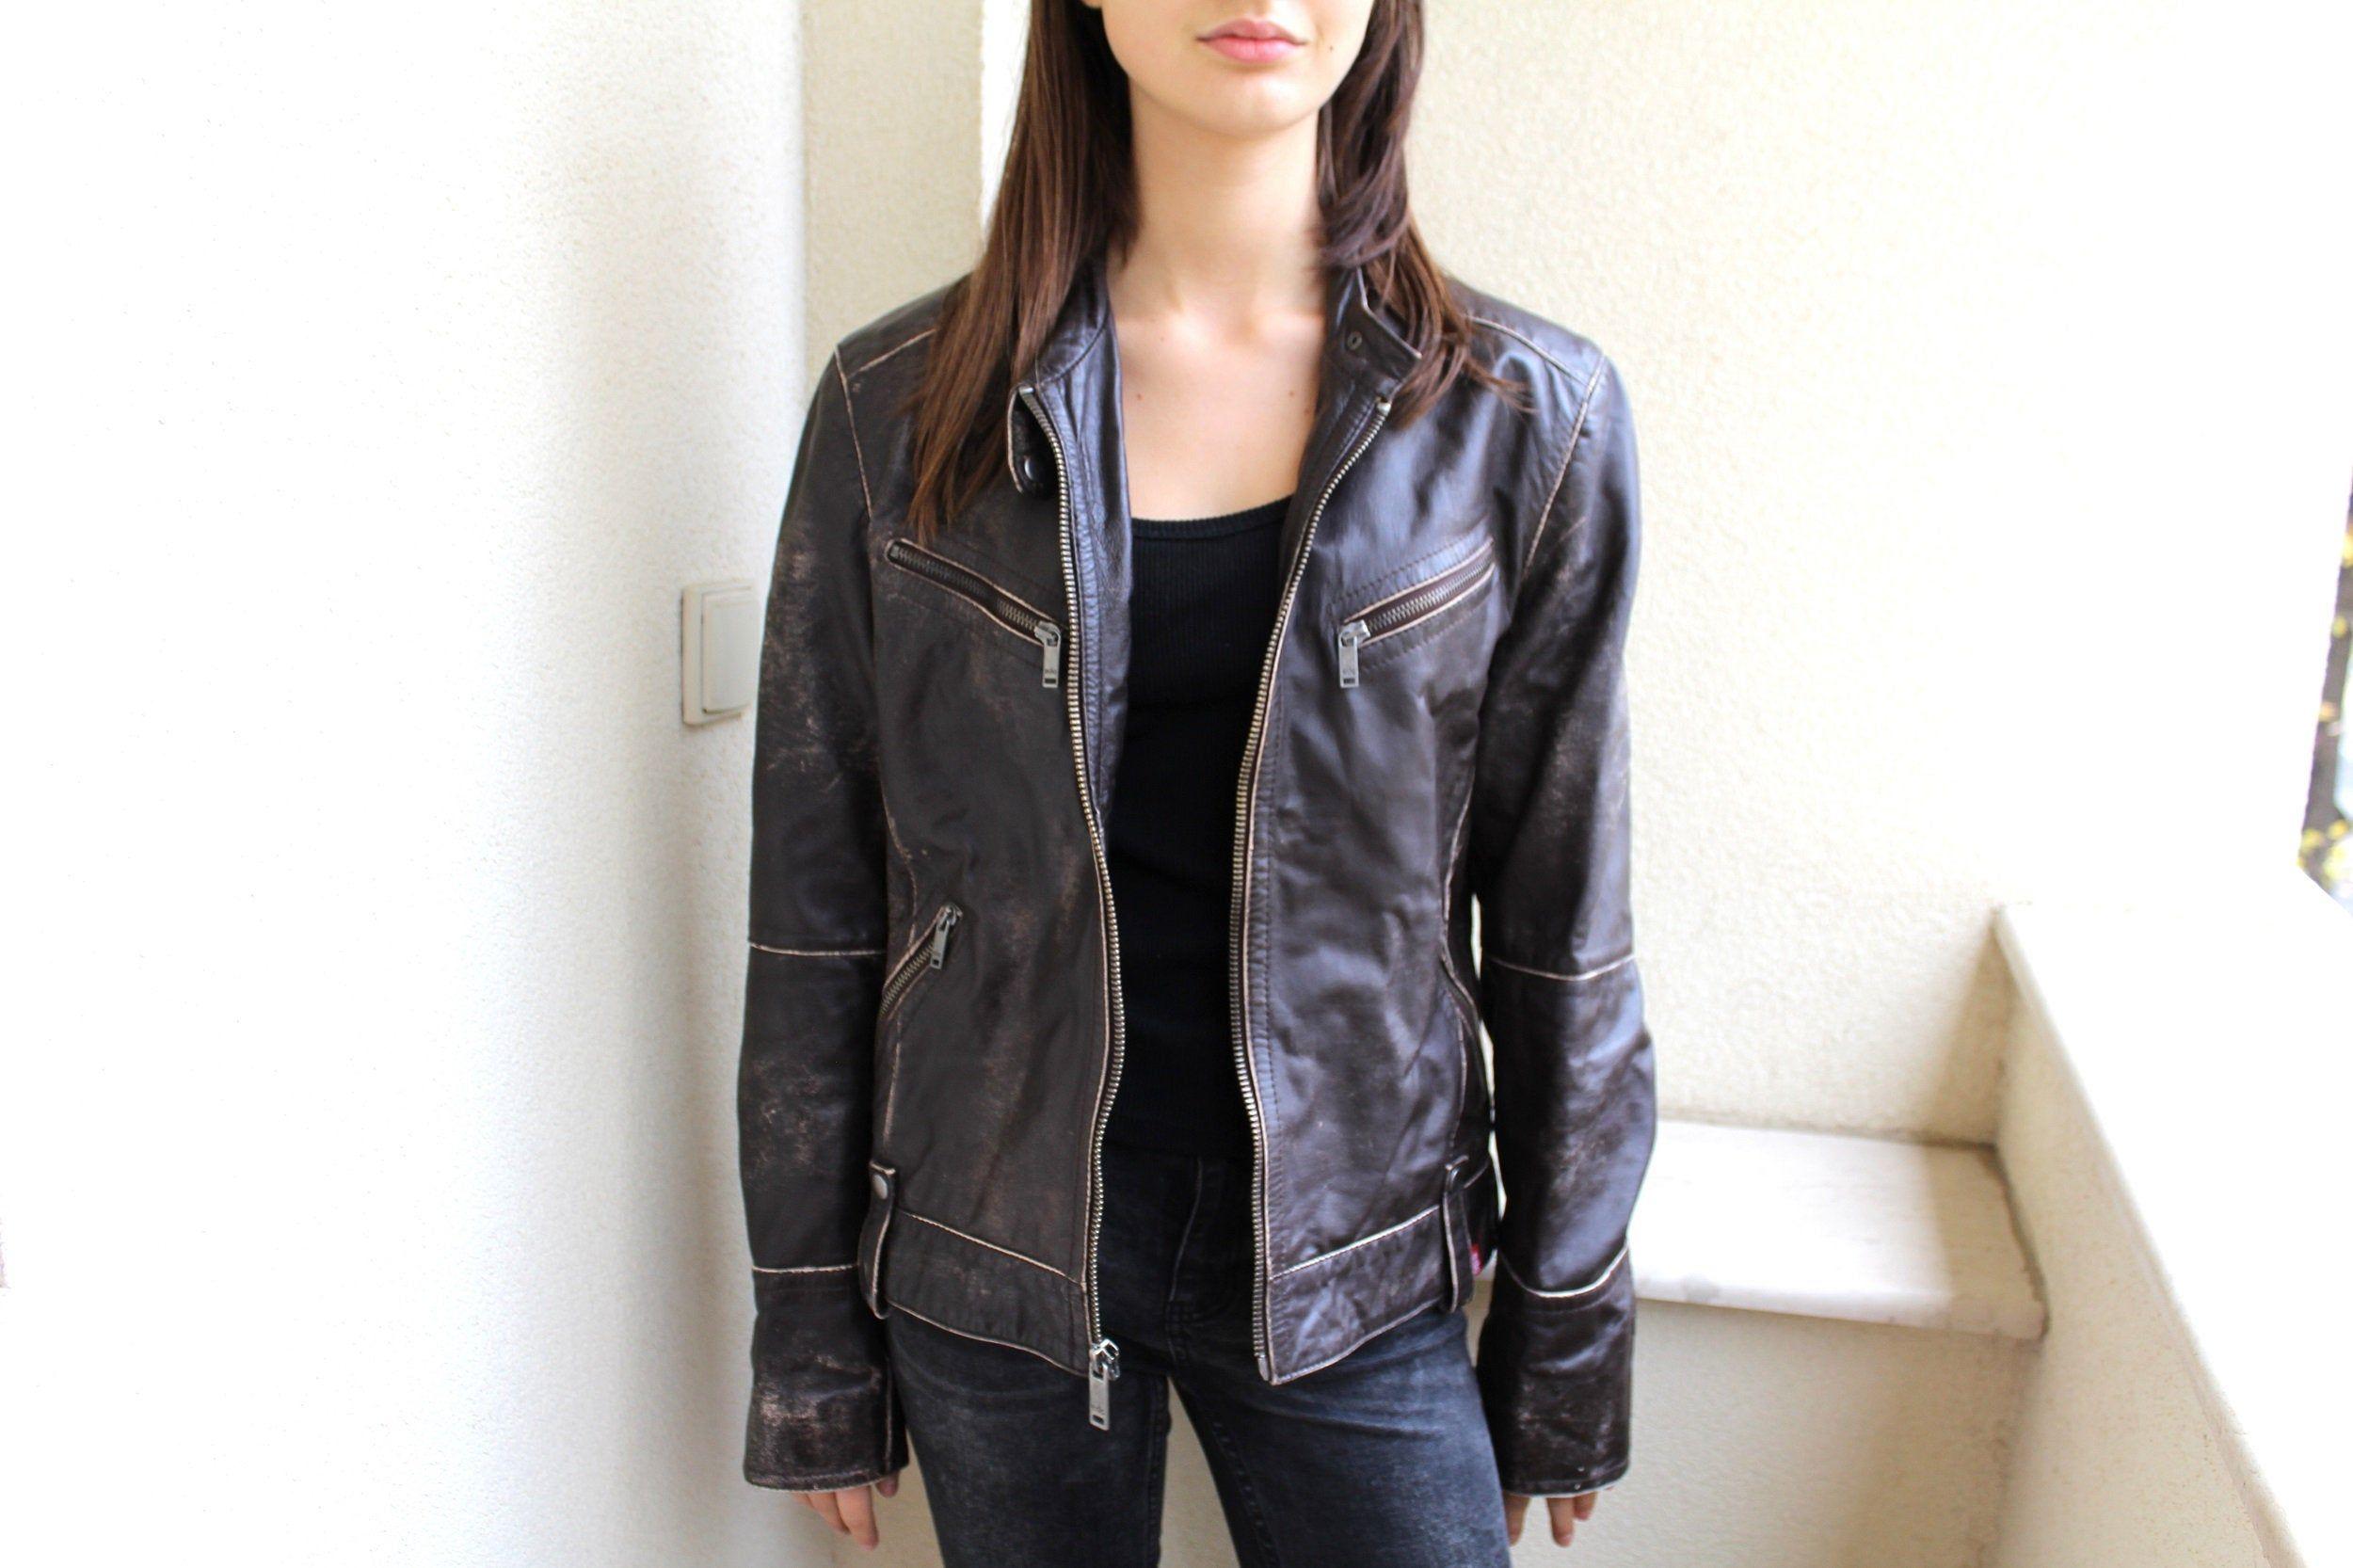 Vintage Leather Jacket Brown Leather Jacket Distressed Etsy Distressed Leather Jacket Vintage Leather Jacket Leather Blazer Women [ 1666 x 2500 Pixel ]